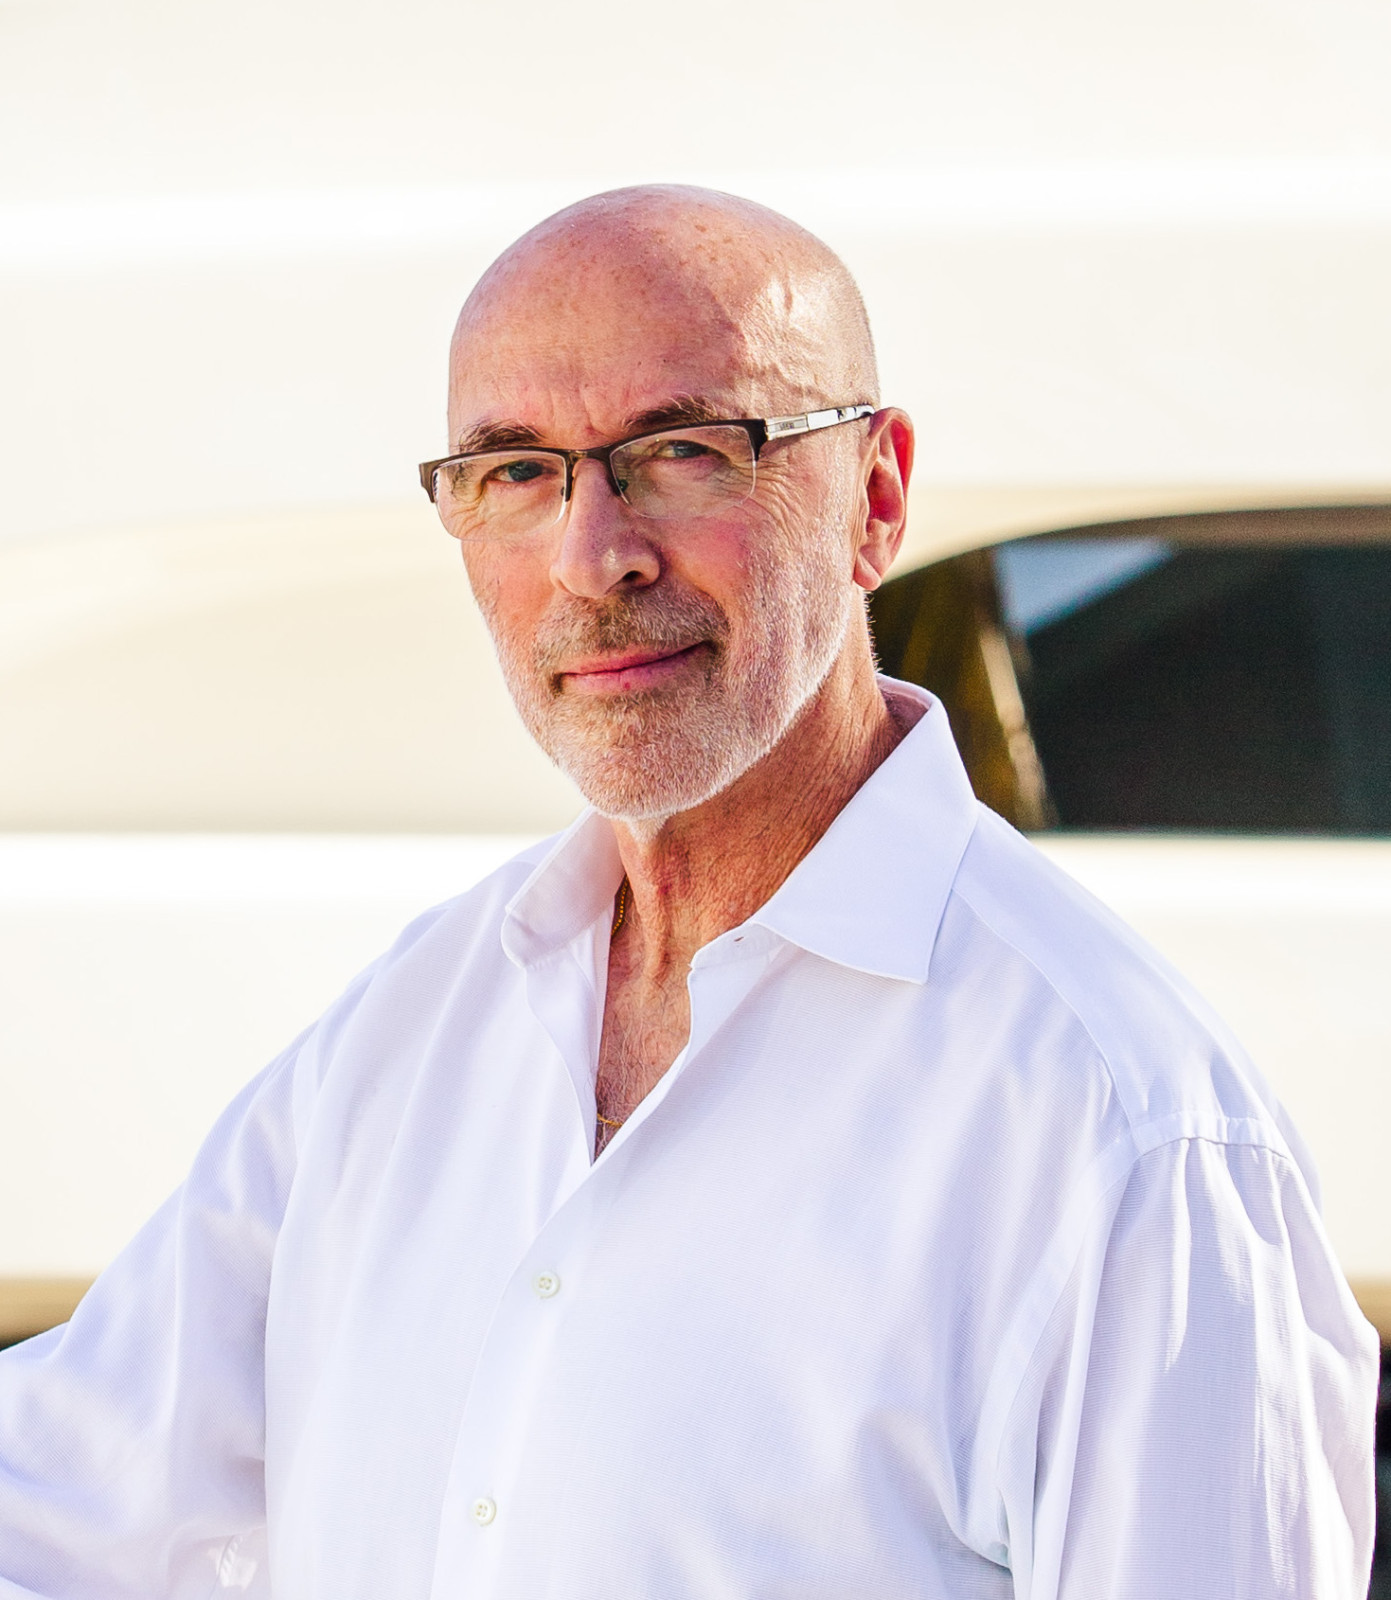 David Ross joins Monaco-based YachtZoo as CEO